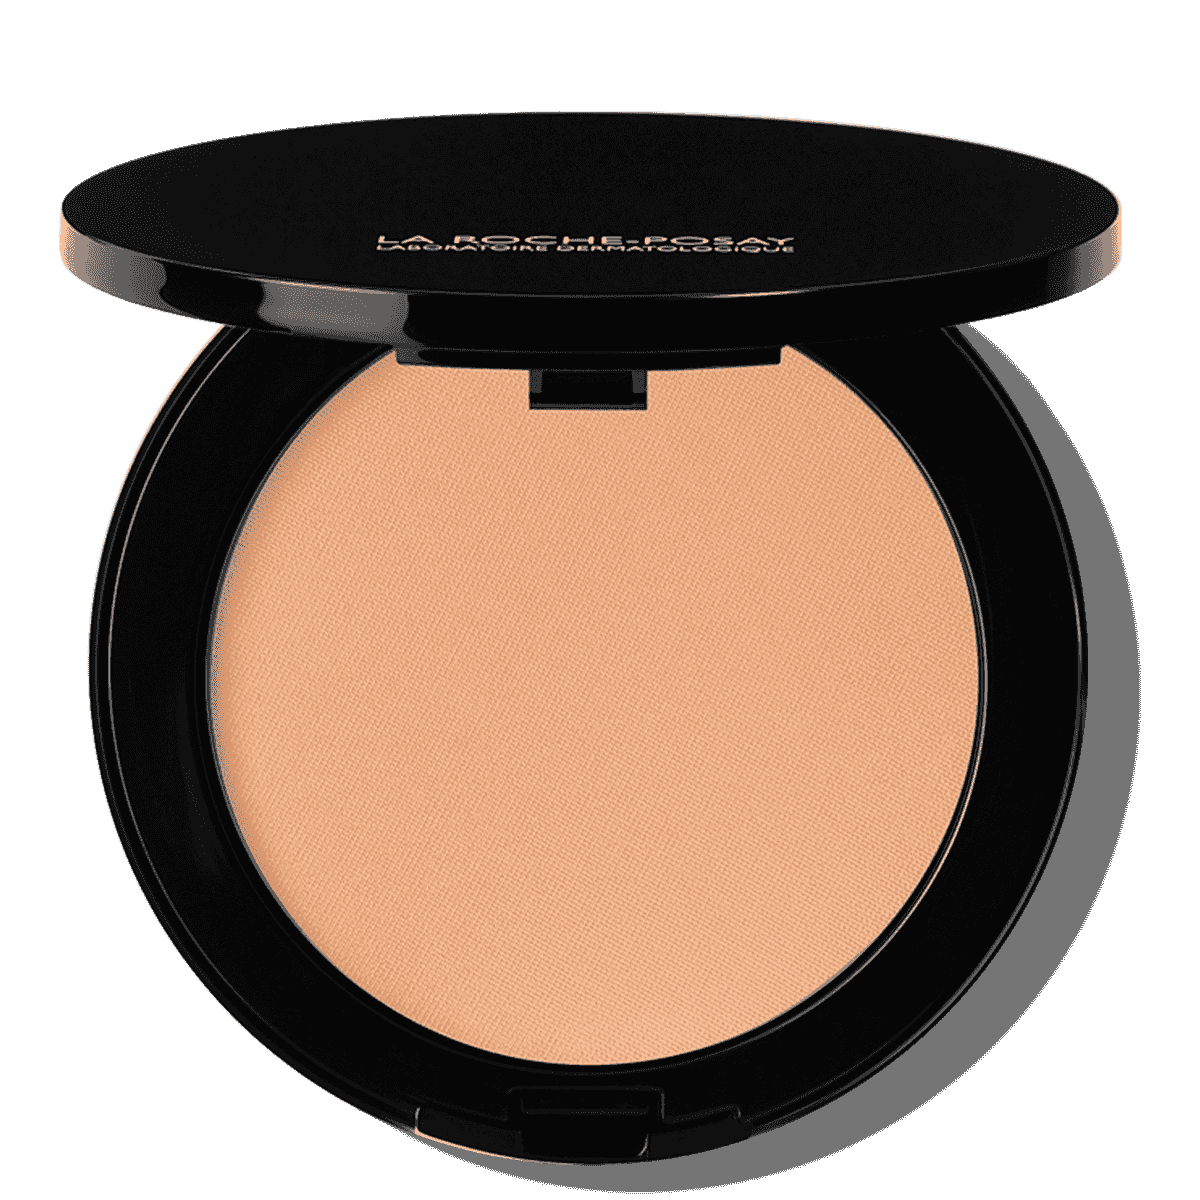 La Roche Posay Citlivá Toleriane Make-up KOMPAKTNÍ PUDR 13SandBeige